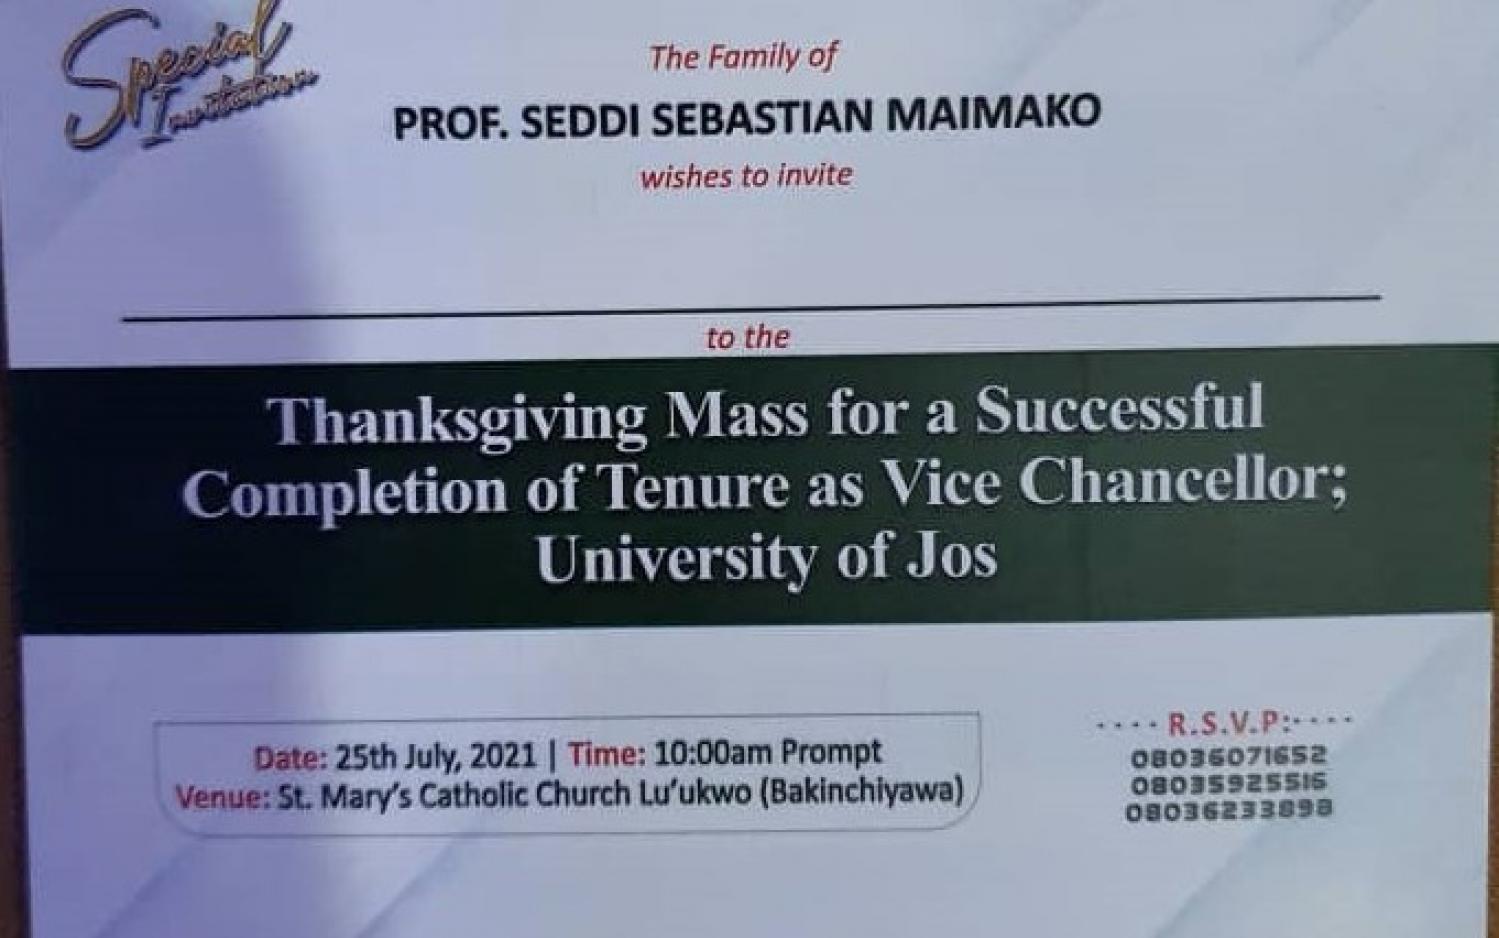 Special Thanksgiving Mass for Professor SS Maimako